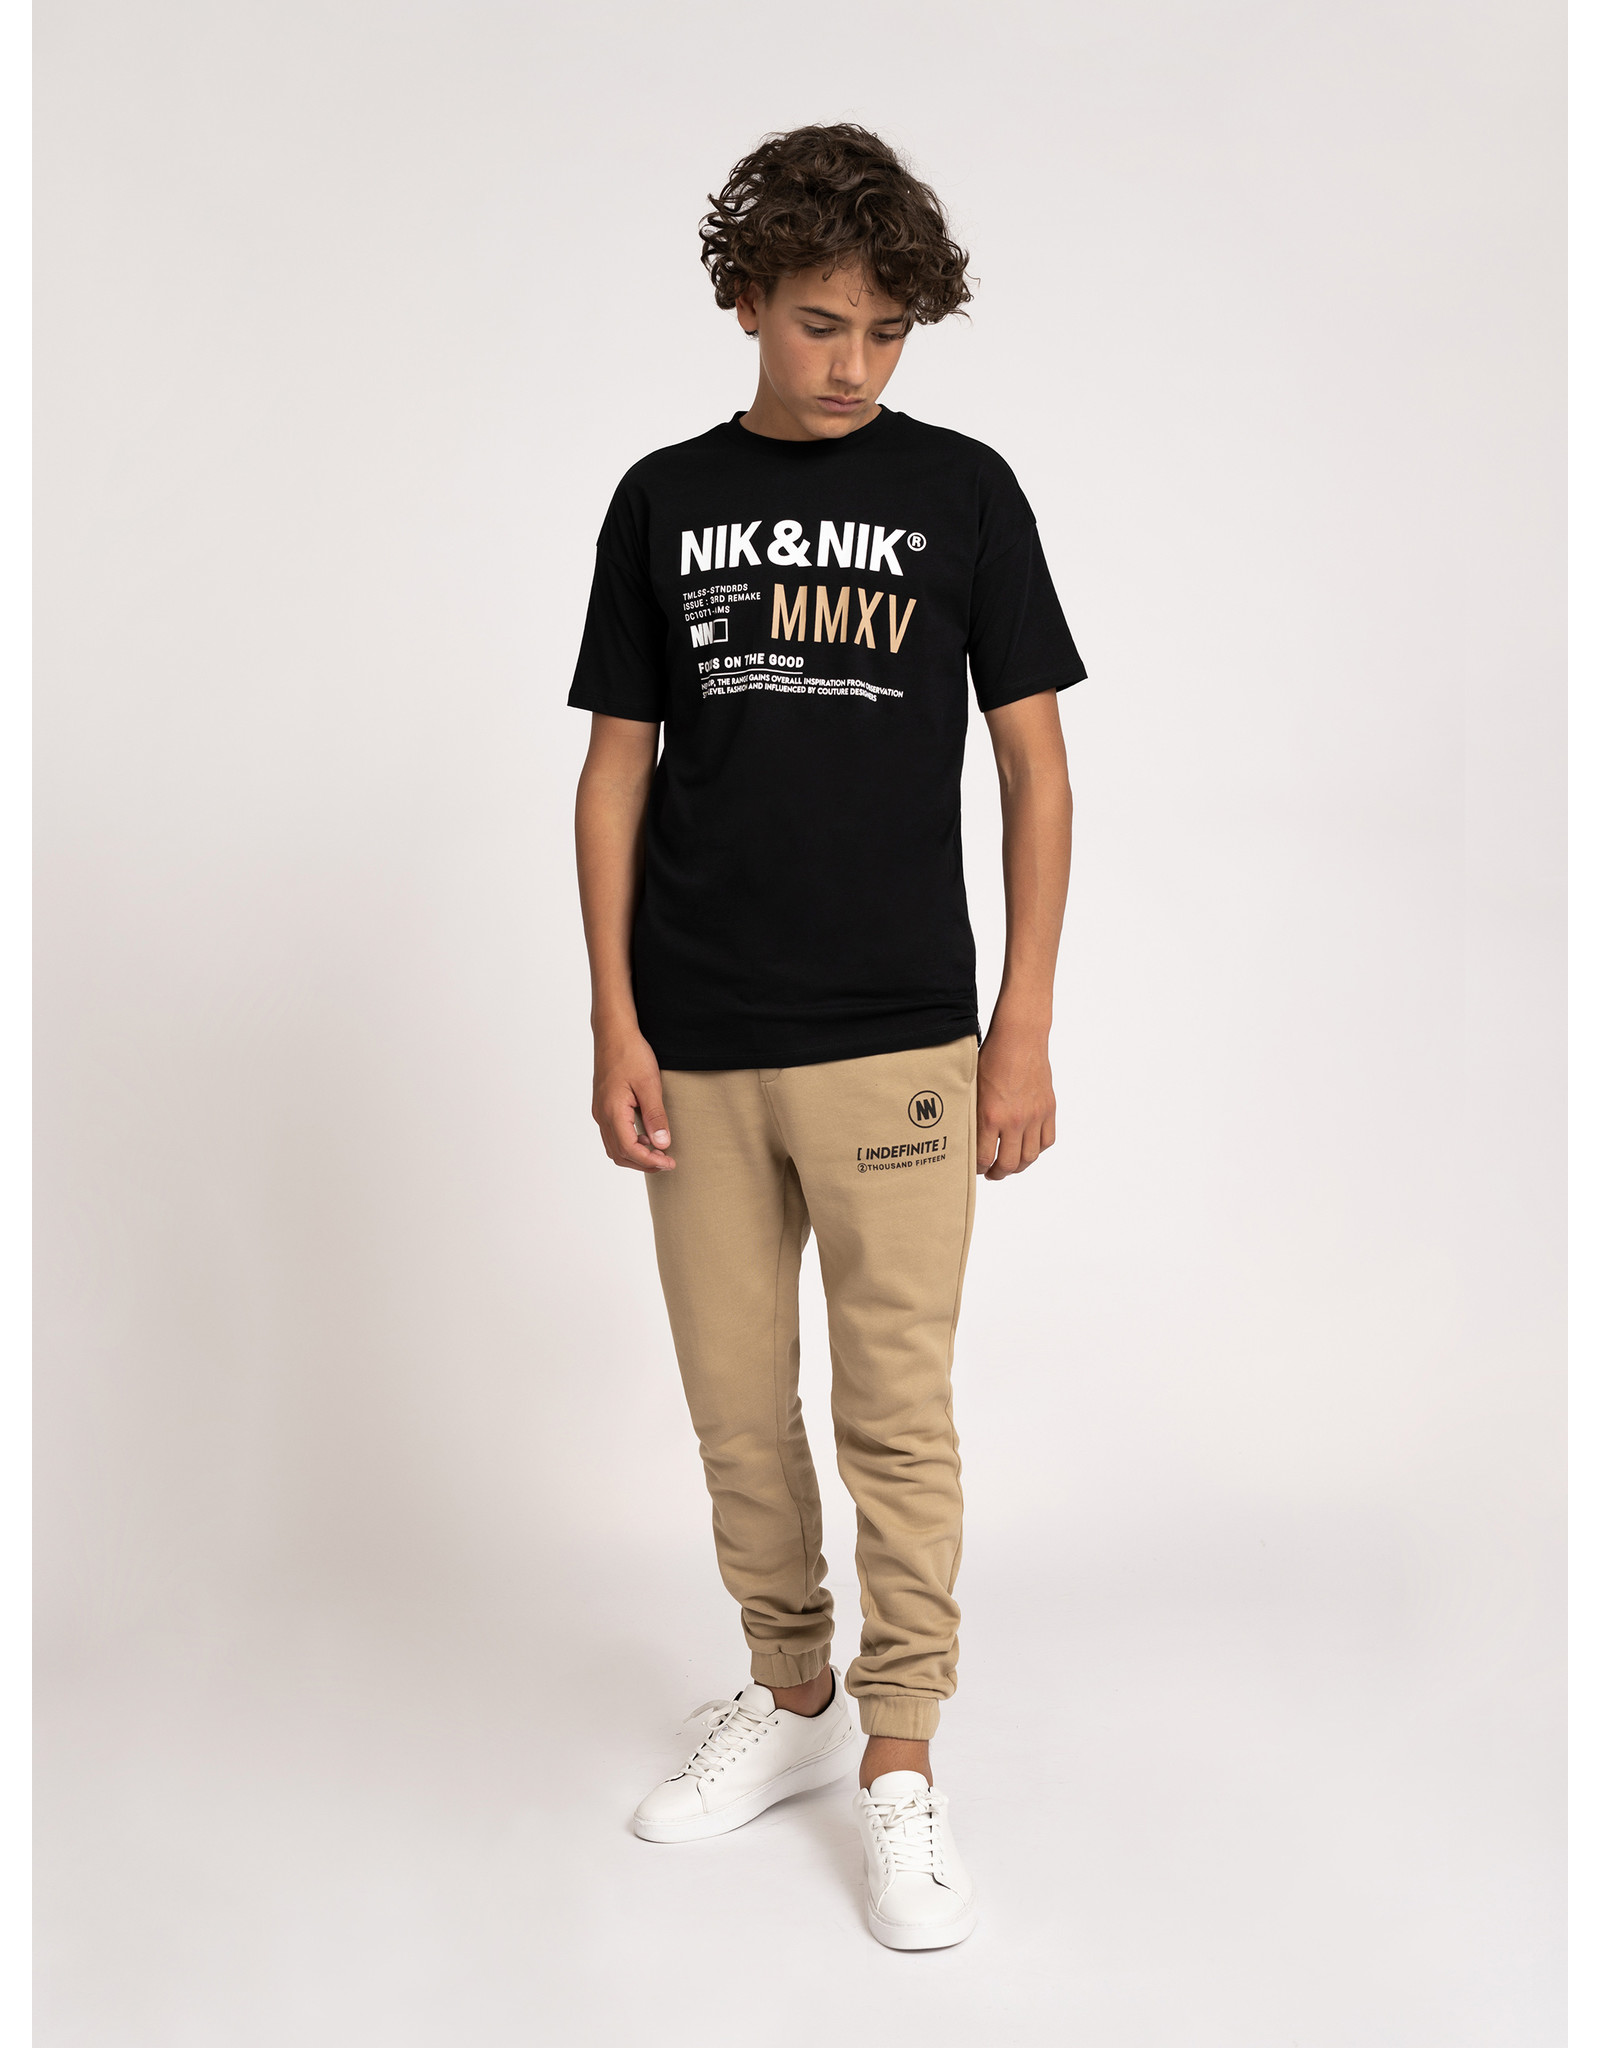 Nik&Nik NIK&NIK Alarik T-Shirt Black